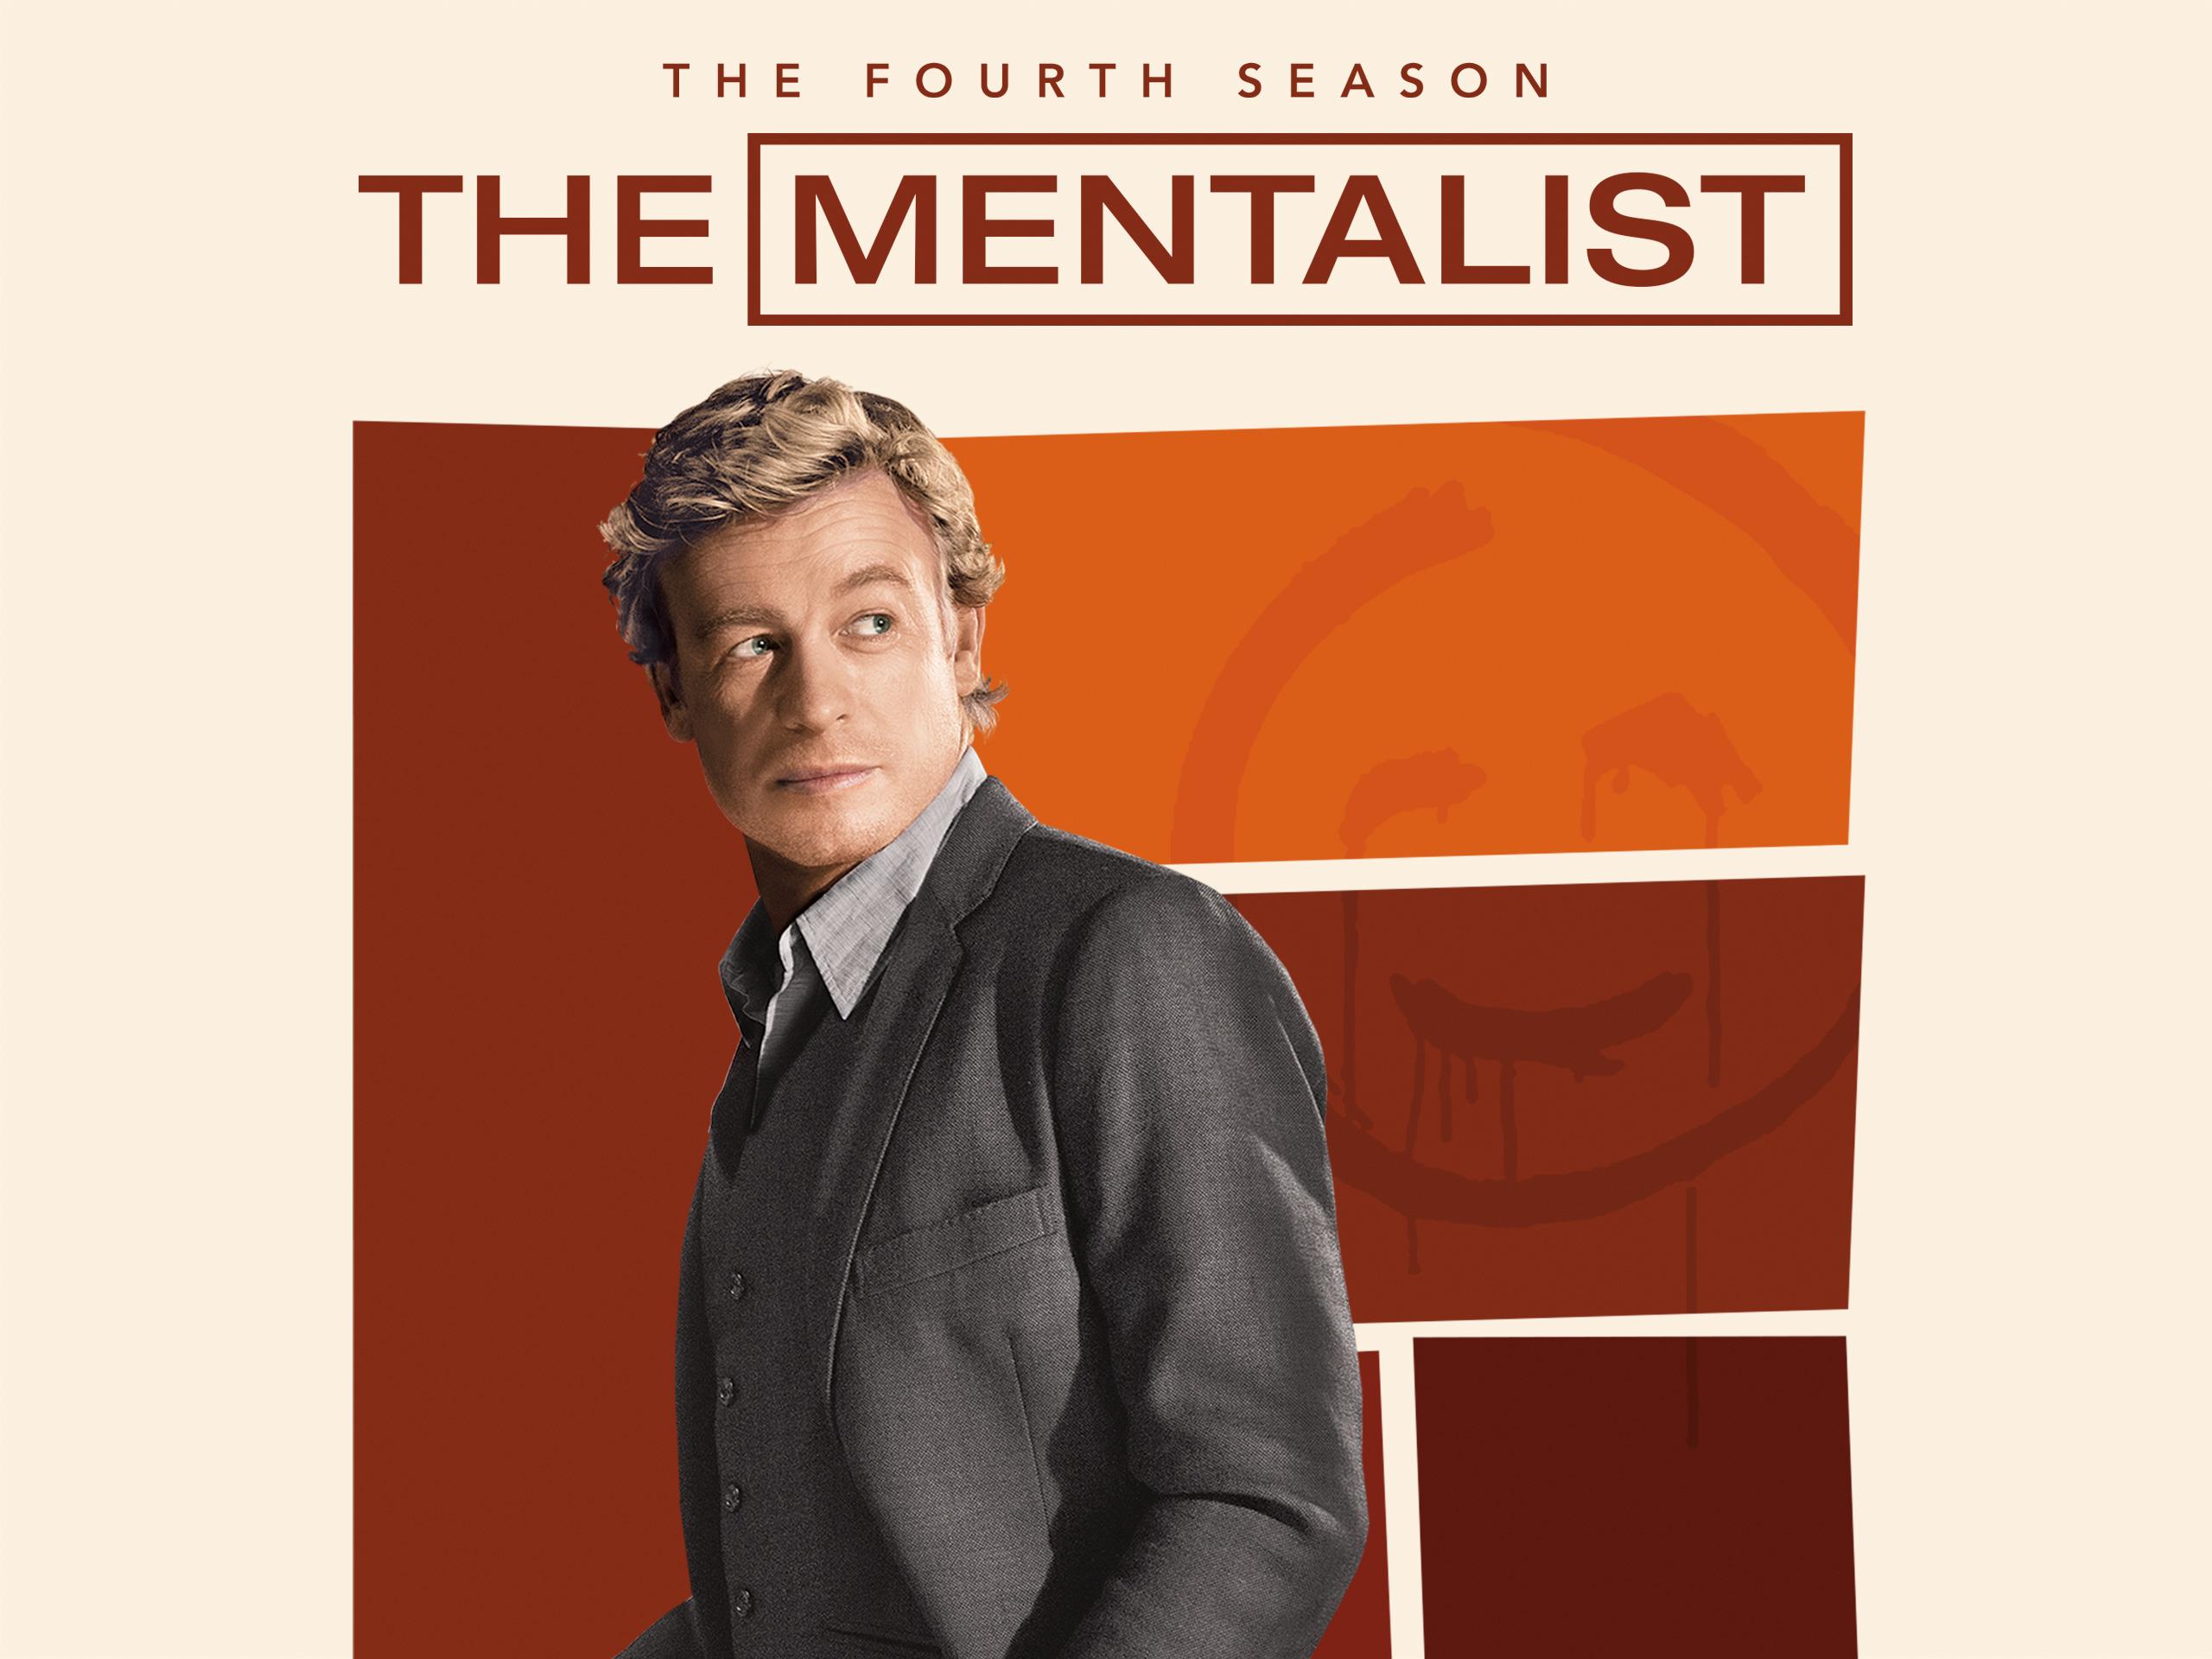 Prime Video: The Mentalist - Season 4